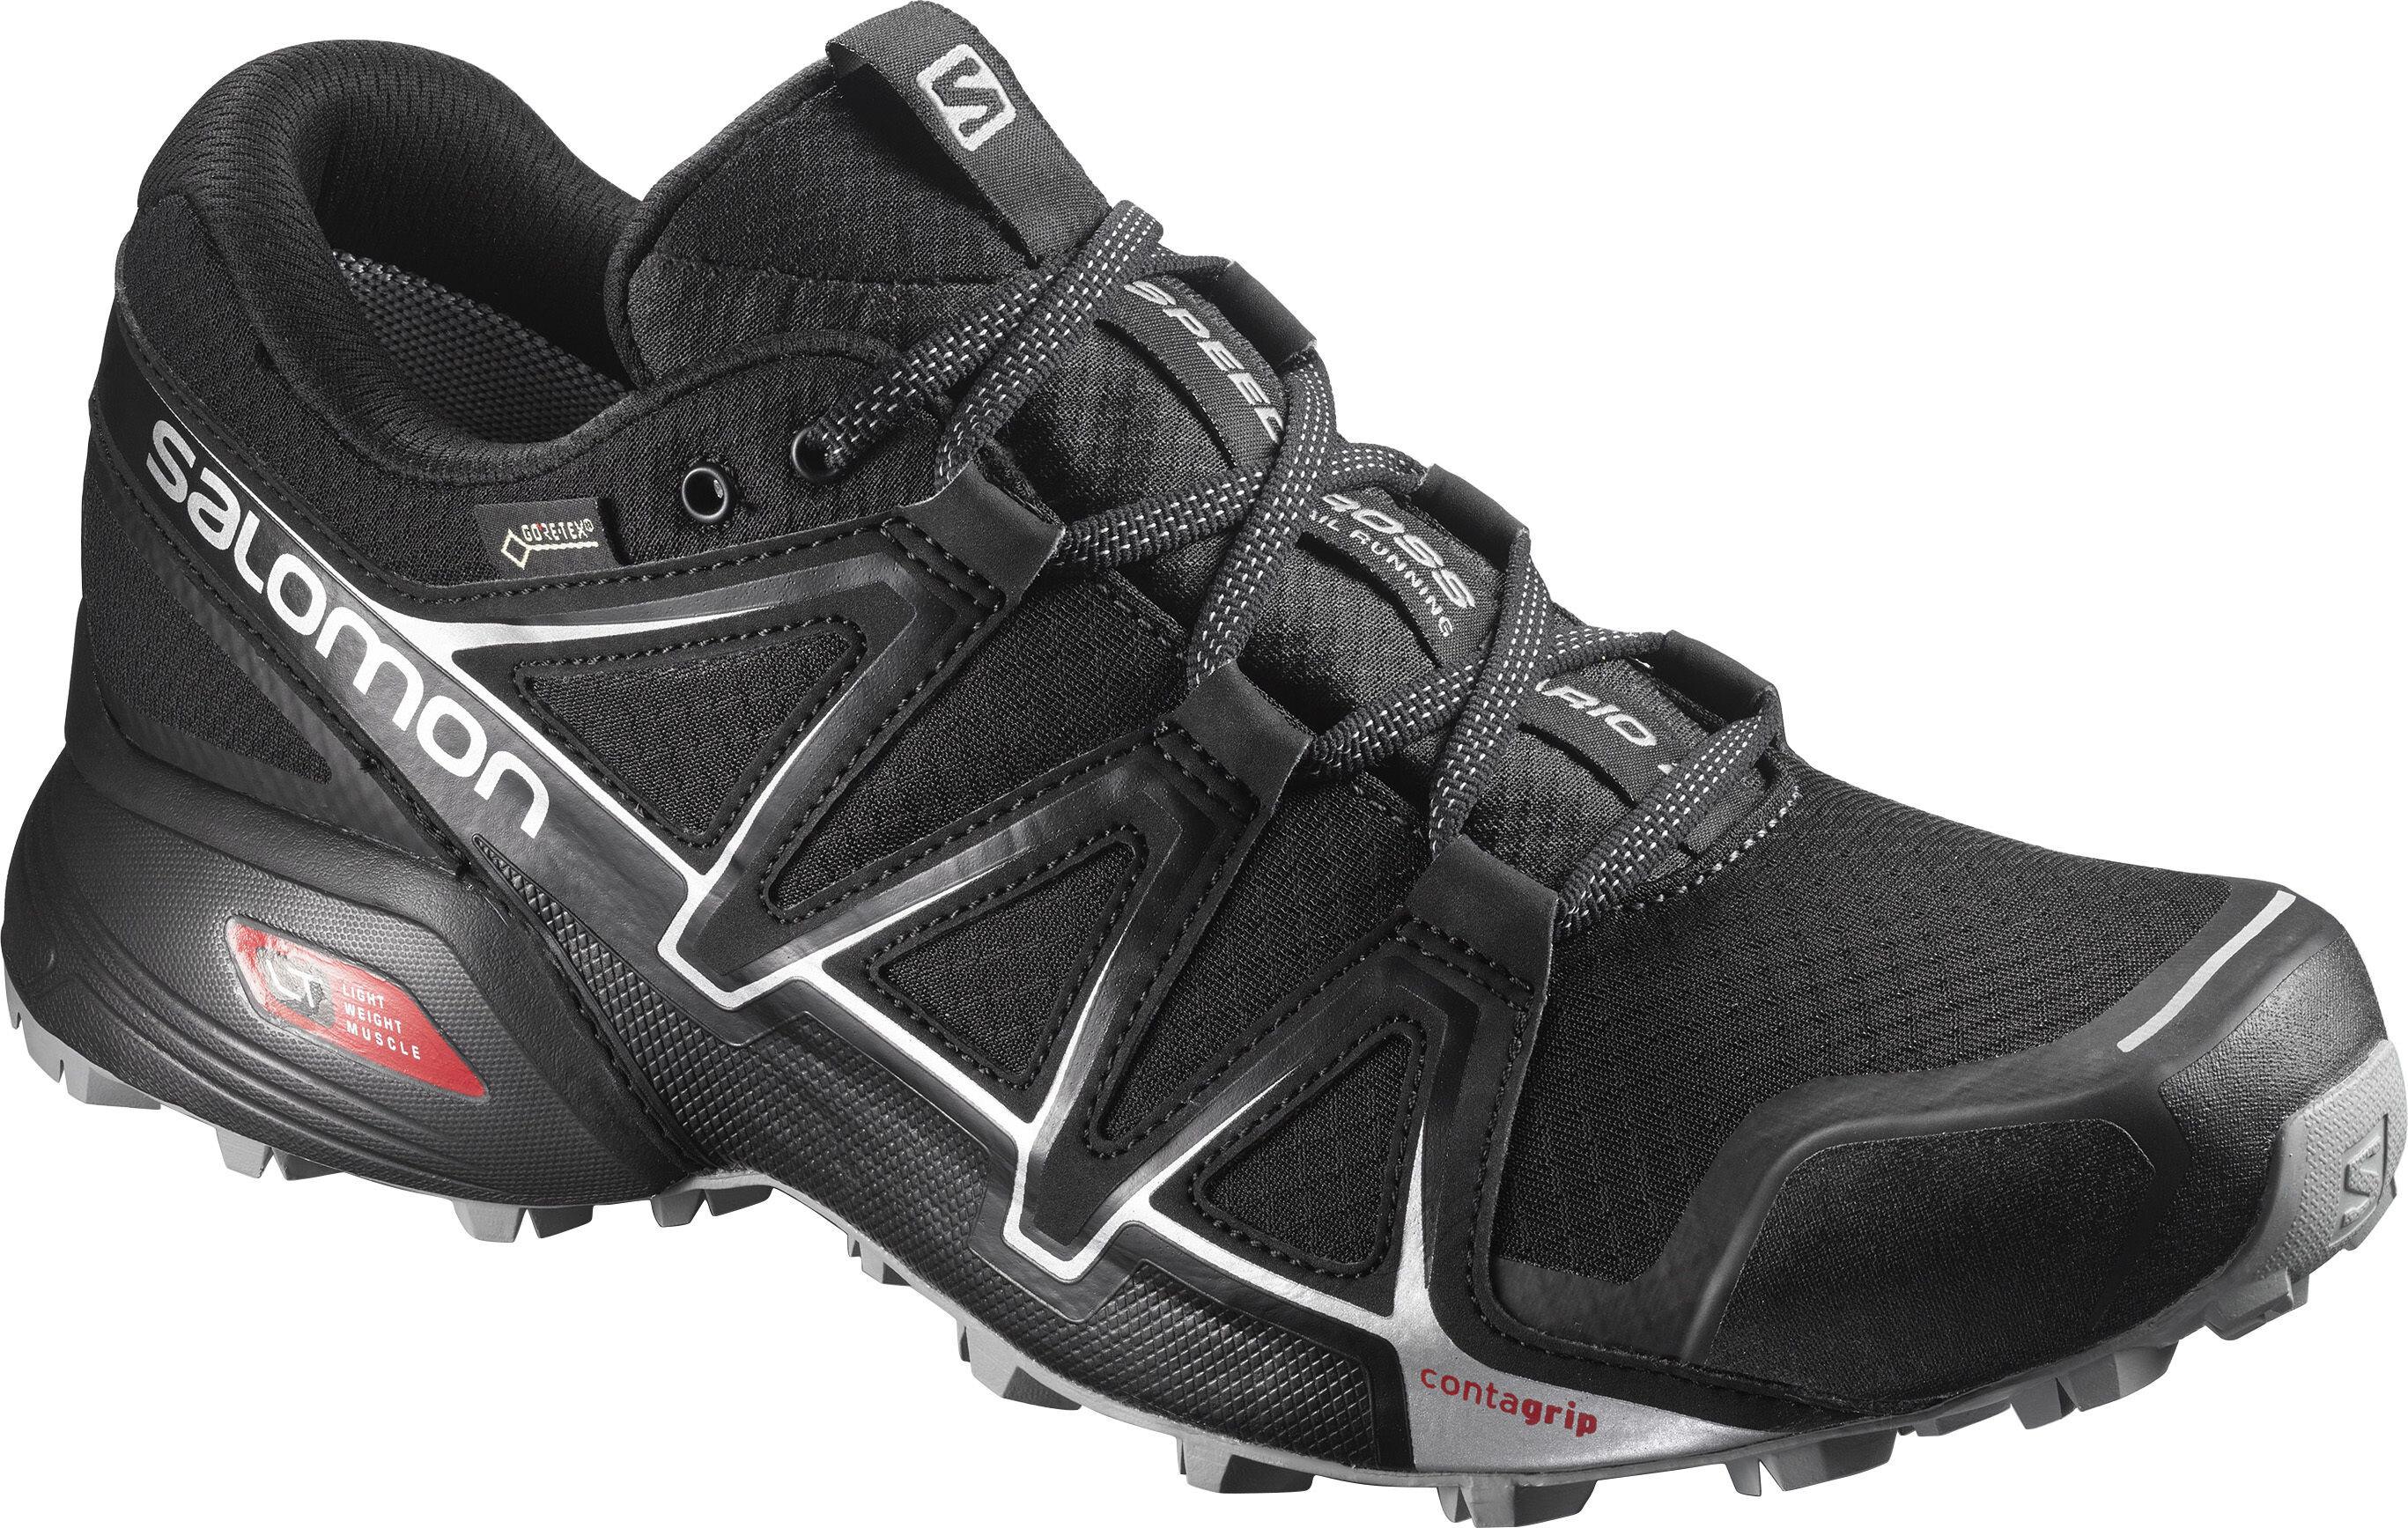 3c6d74847d1 Salomon Speedcross Vario 2 GTX - Chaussures running Homme - noir sur ...